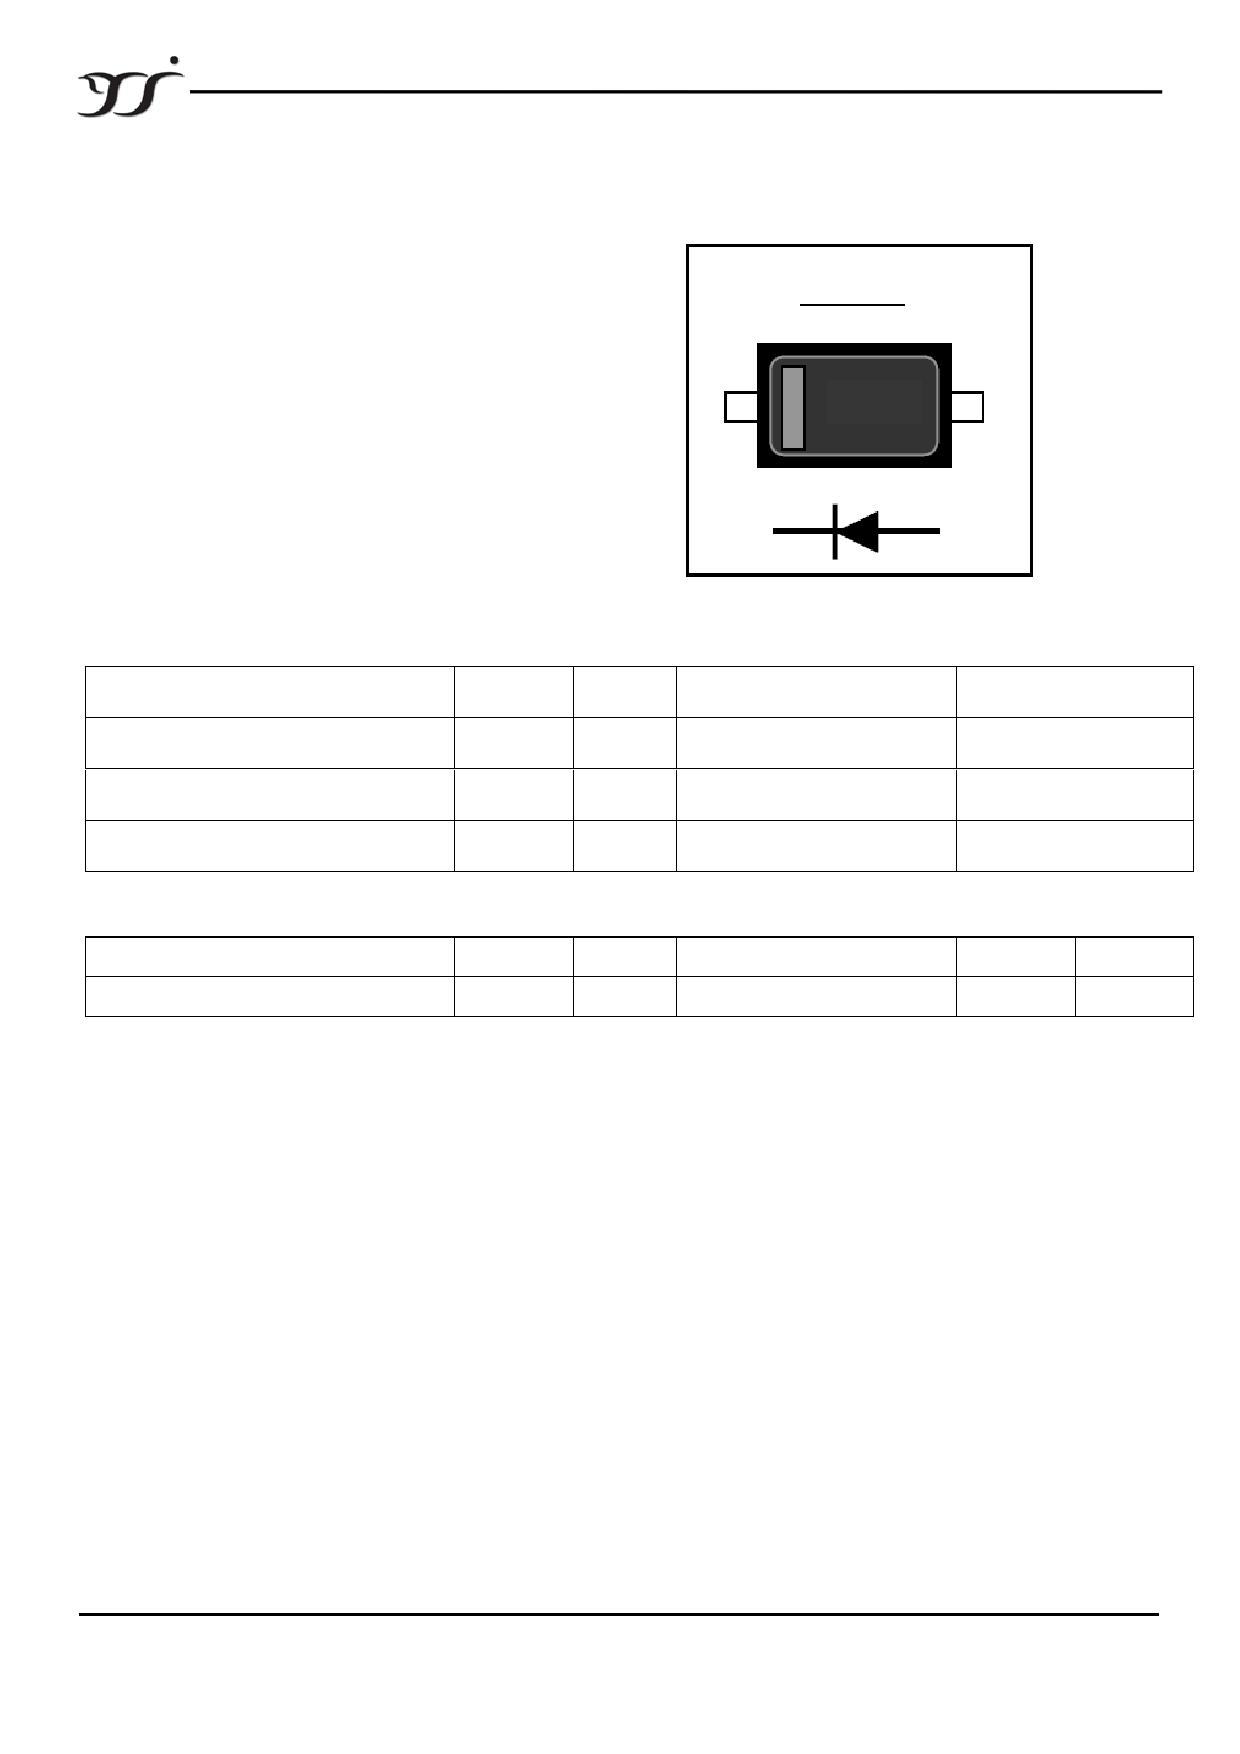 MMSZ5250B Datasheet